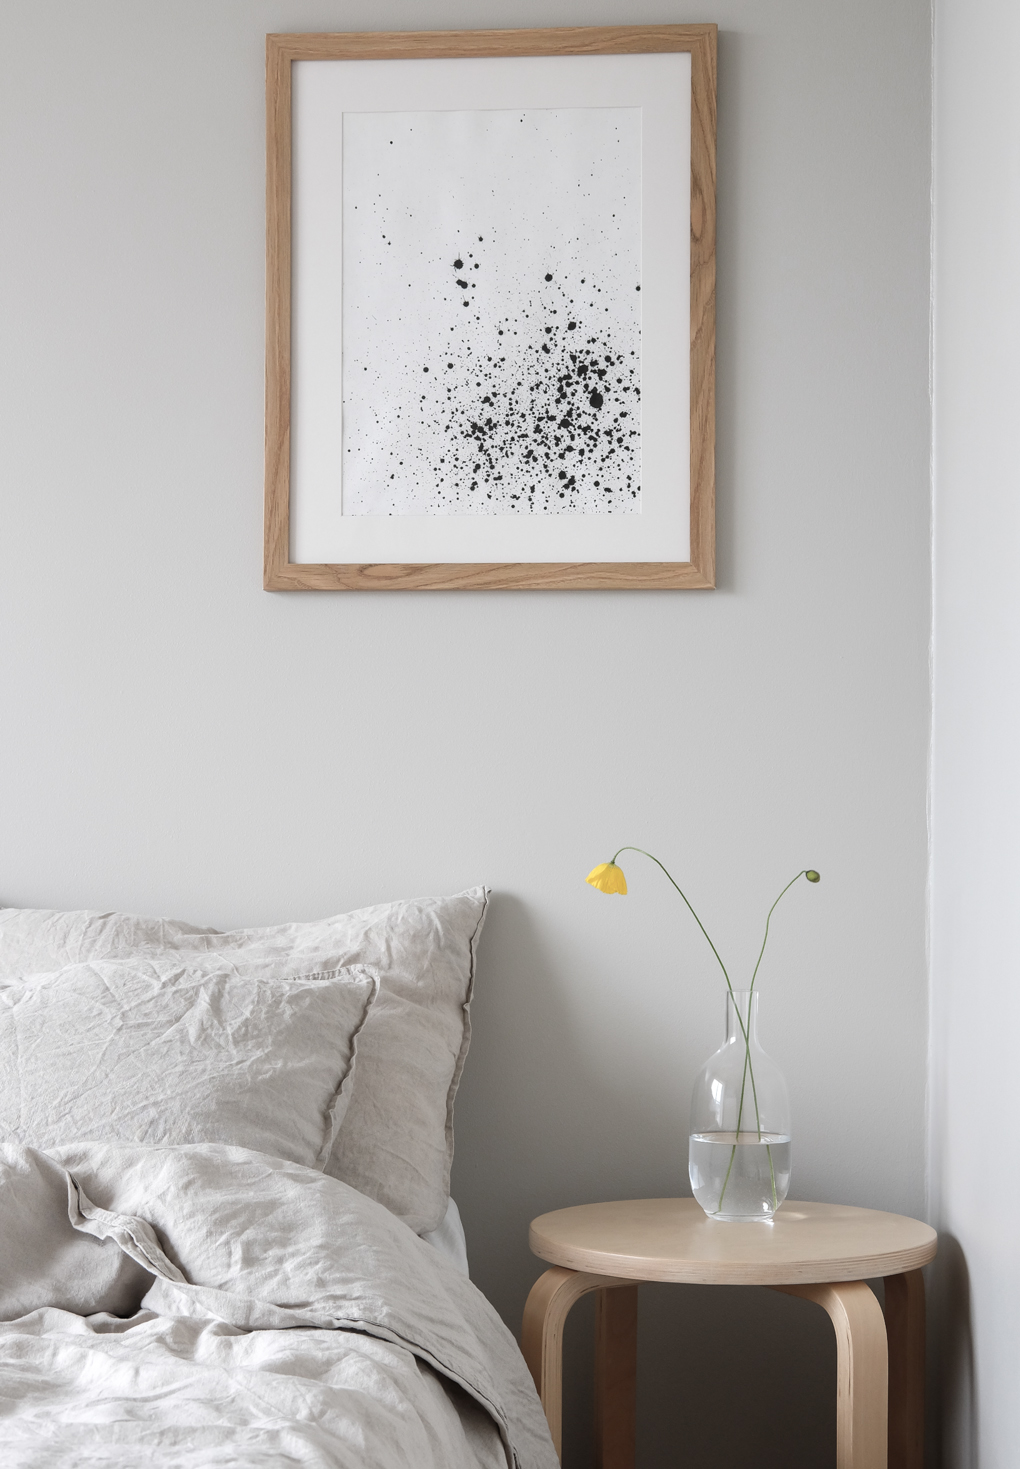 Minimalist-Scandinavian-style-bedroom-beige-linen-bedding-light-grey-walls-light-wood.-Styling-and-photo-by-Anu-Reinson.jpg